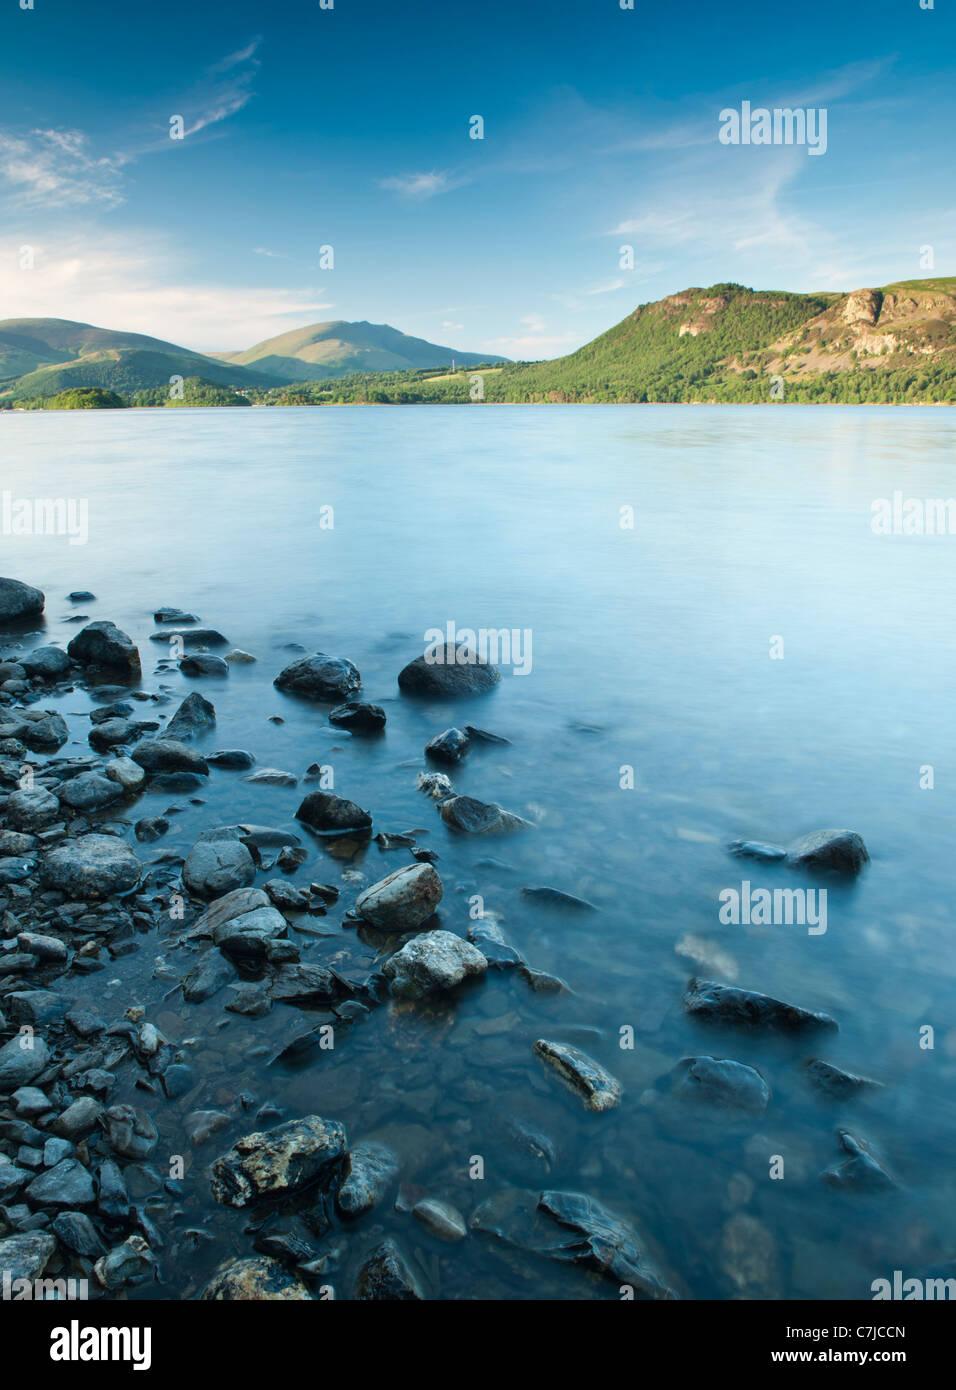 Rocas en la orilla del lago, Brandelhow Bay, Lake District, Cumbria, Reino Unido Foto de stock